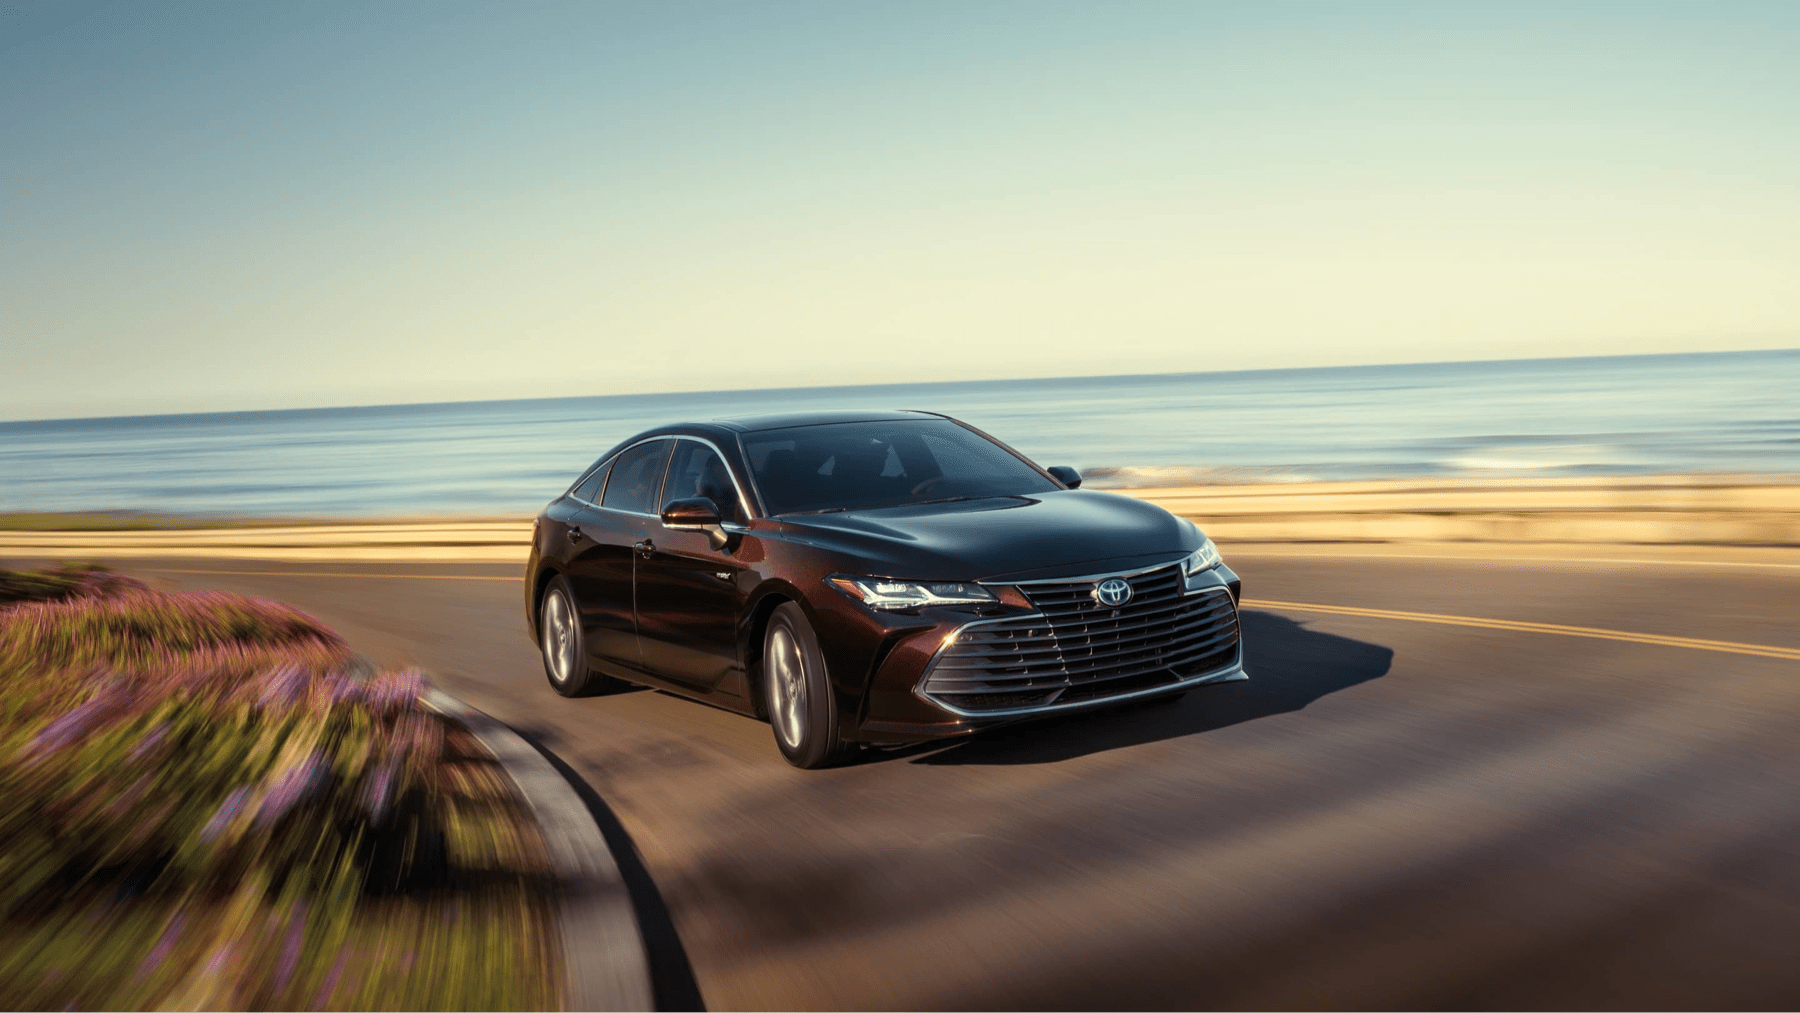 2020 Toyota Avalon on road